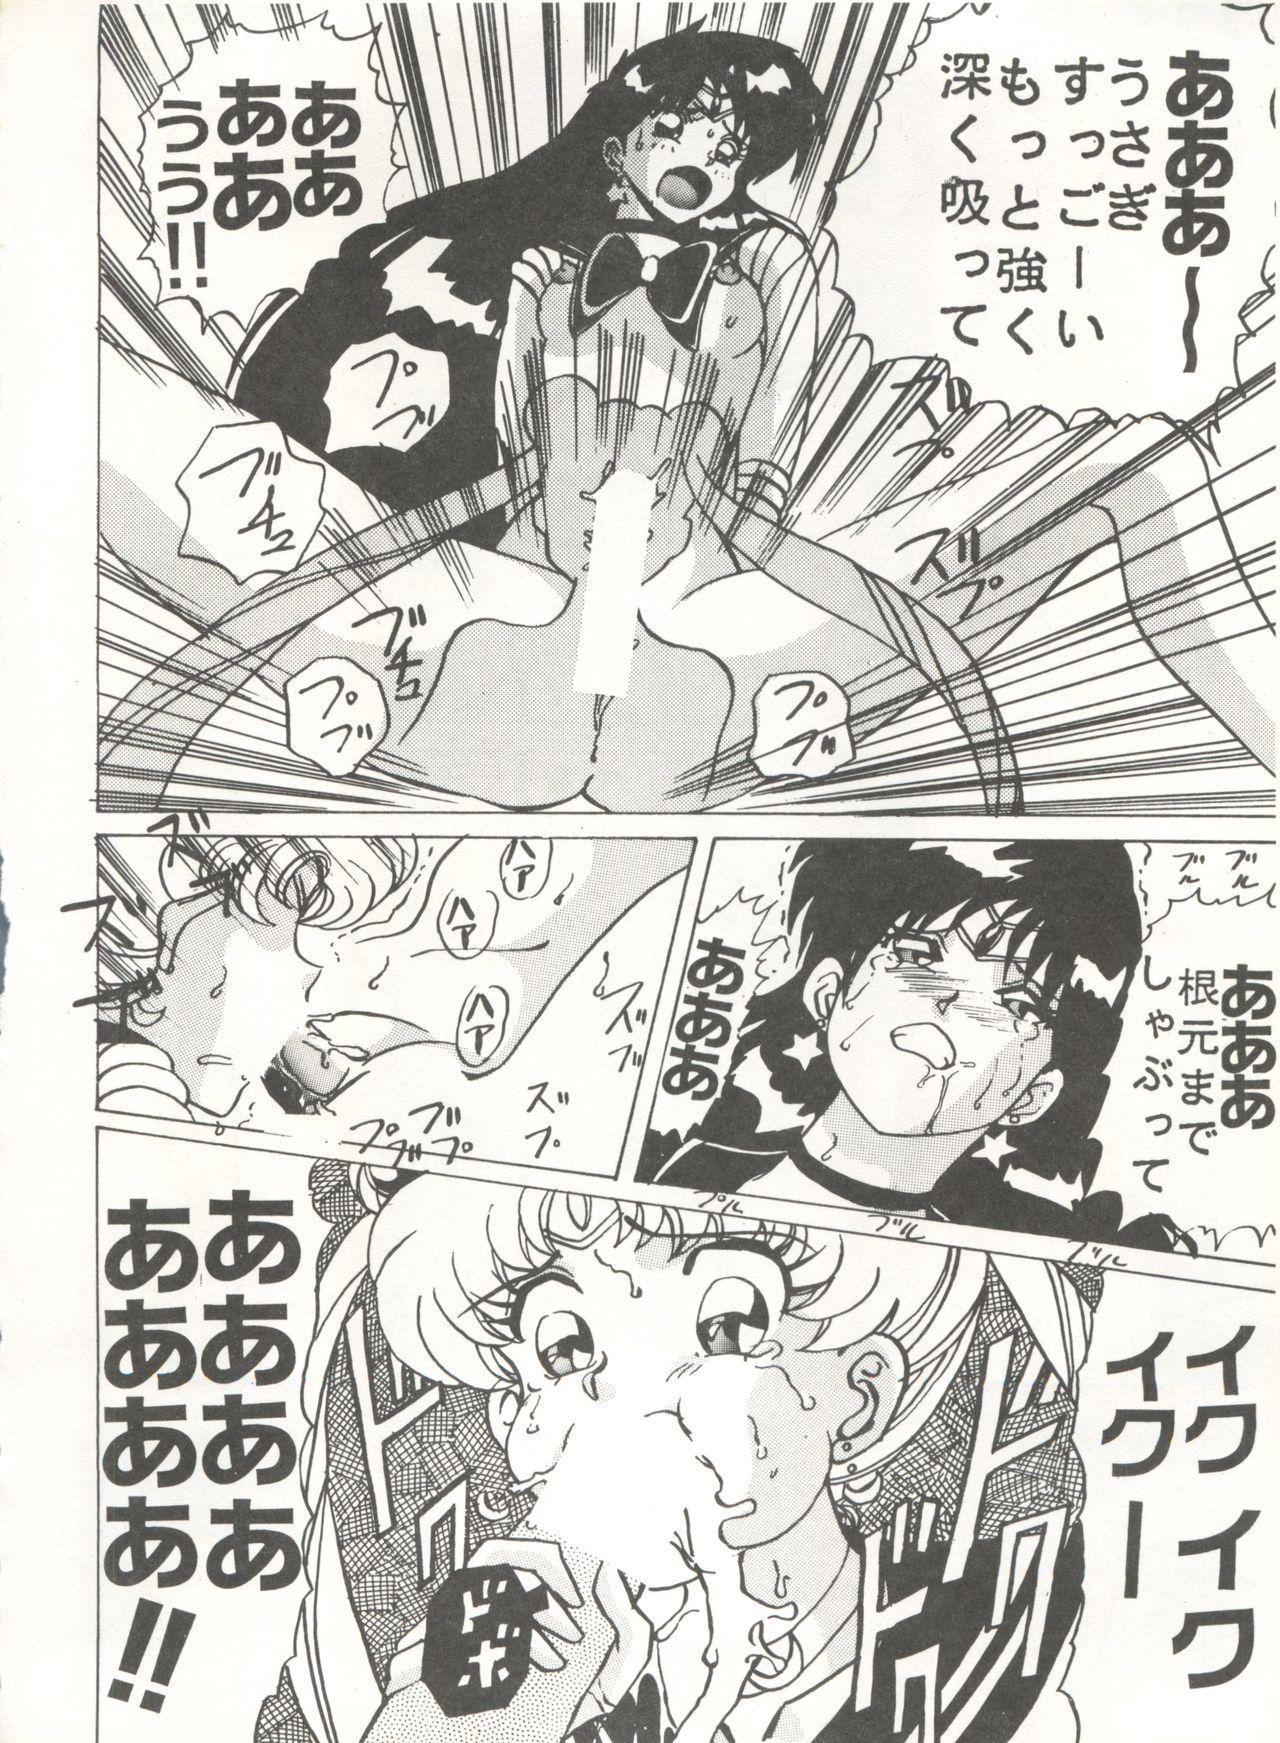 [Global One (MARO)] Sadistic 5 (Cutey Honey, Devilman, Sailor Moon), [Global One (MARO)] Sadistic (Dirty Pair, Fushigi no Umi no Nadia, Sailor Moon), [Studio Ikkatsumajin] .ribbon (Hime-chan's Ribbon) 51